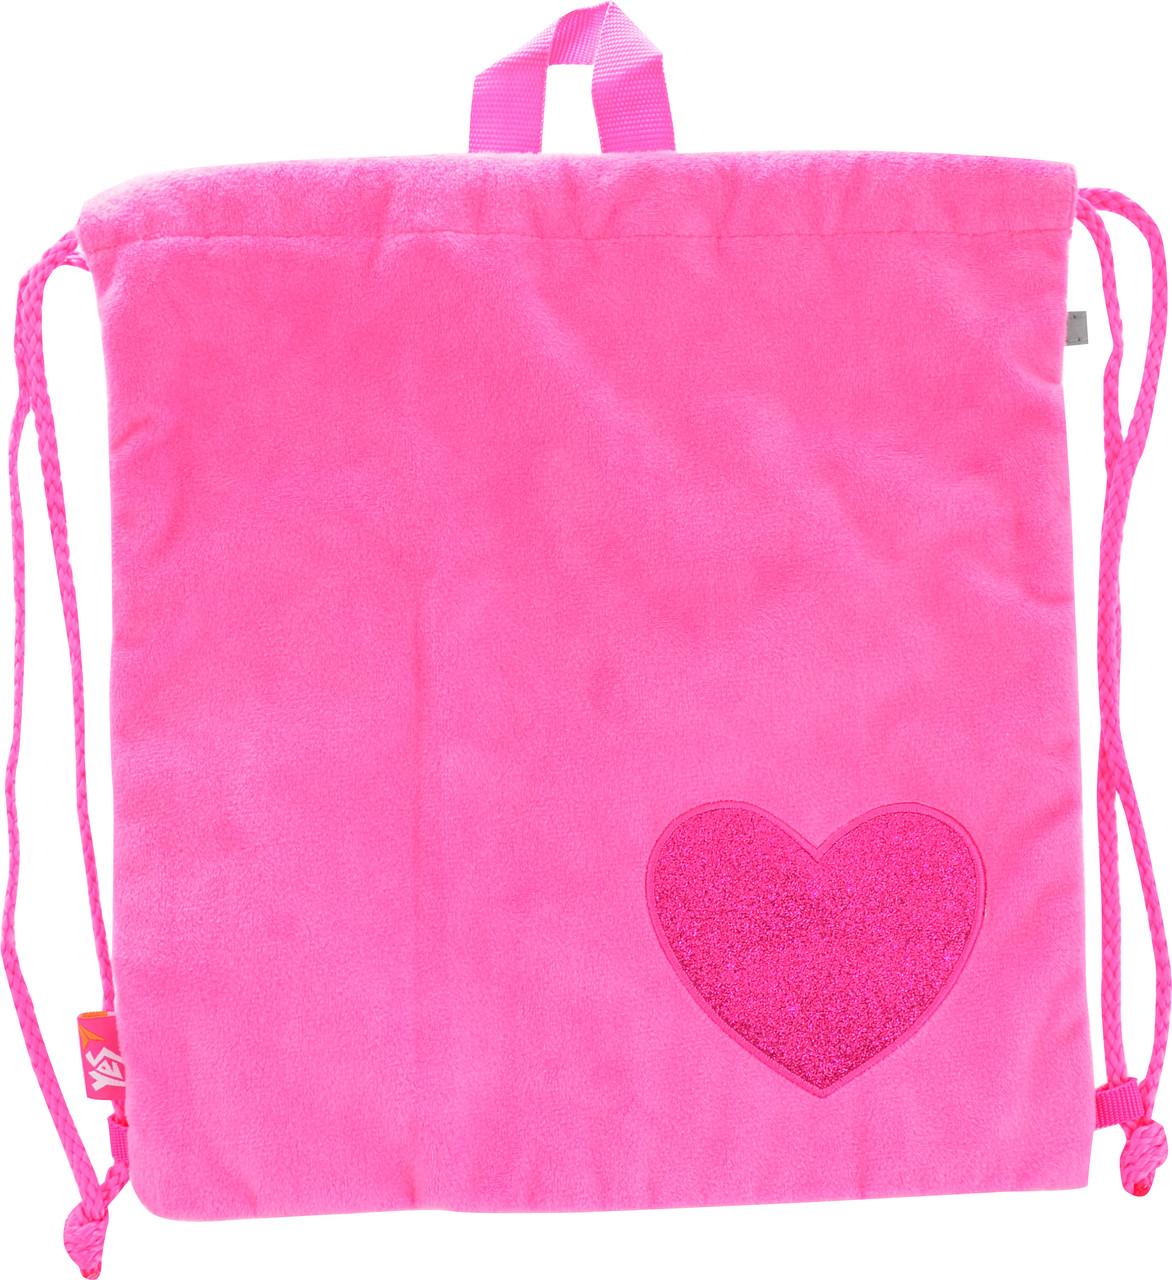 Сумка-мешок YES детская SB-14 Heart код: 556799